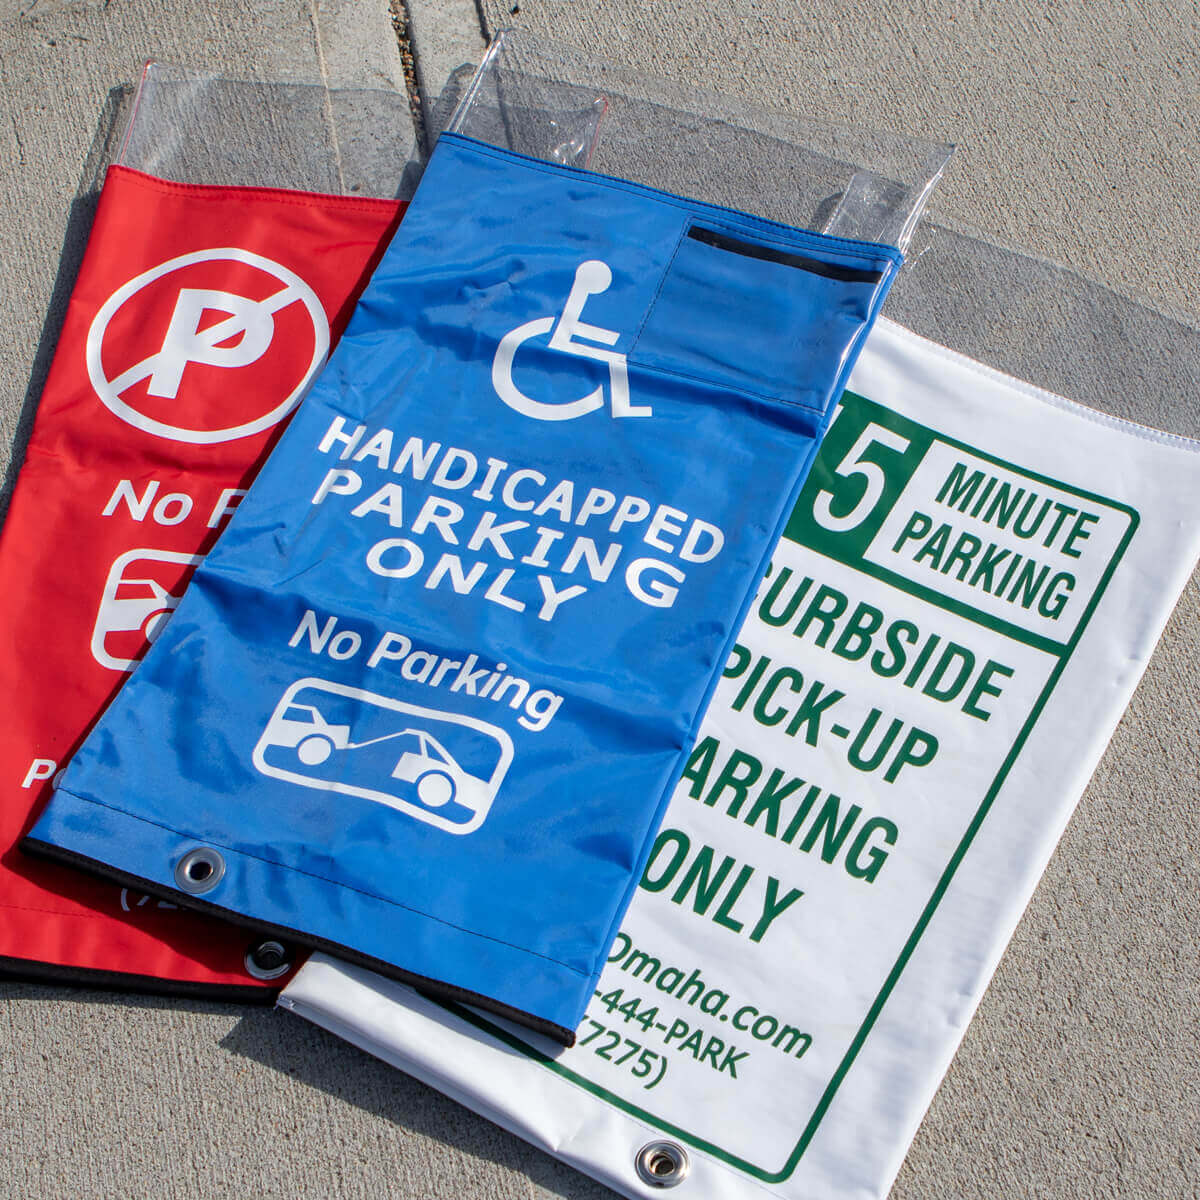 Variety of Parking Meter Covers